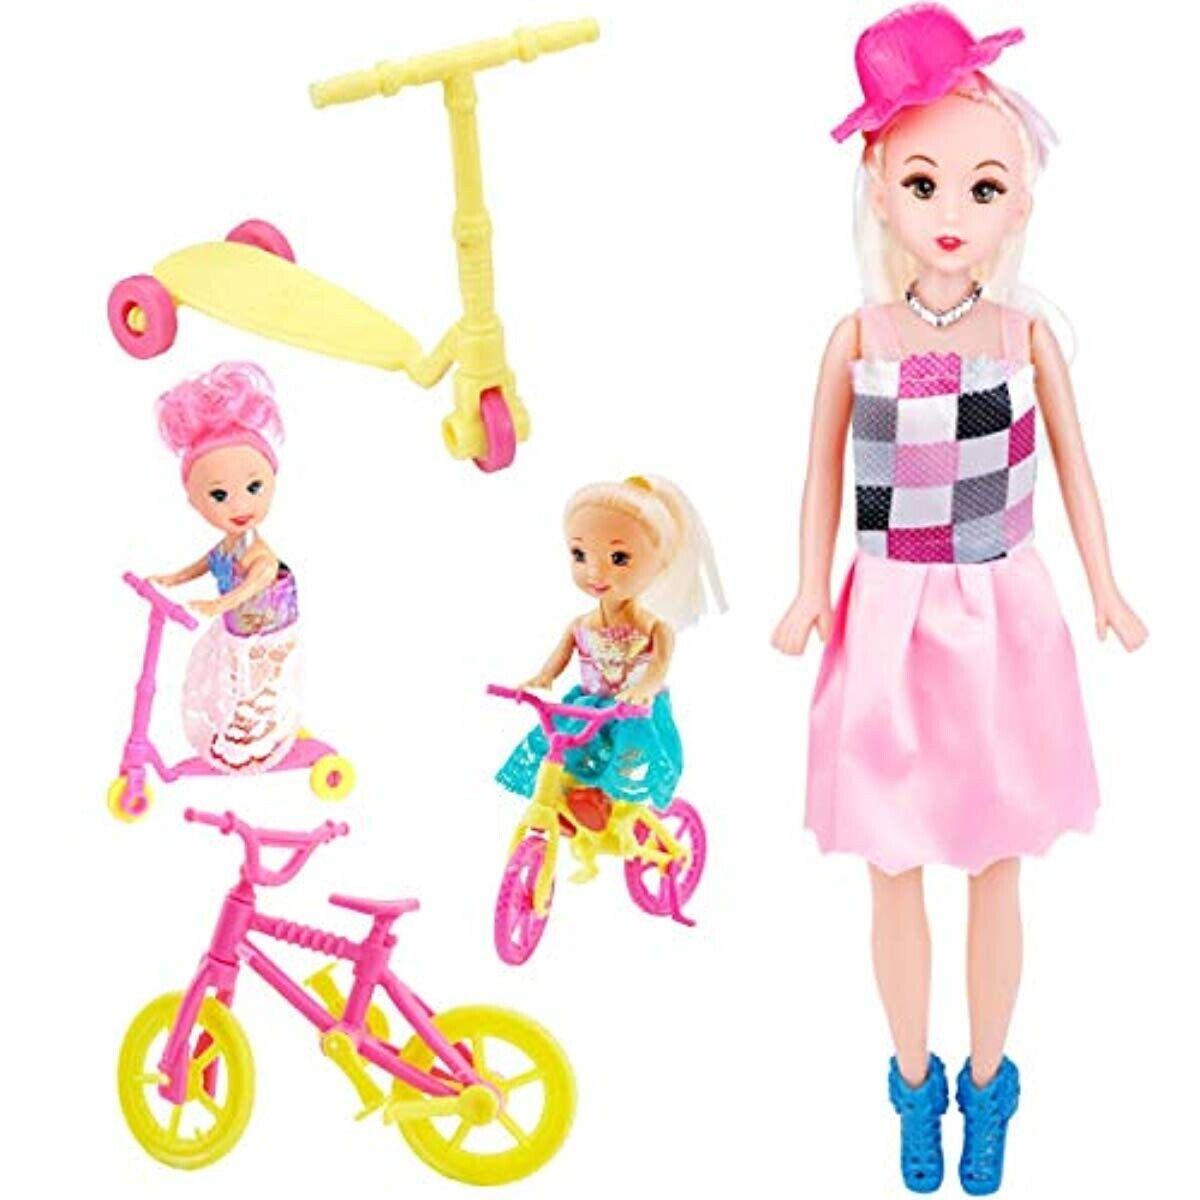 73PCS For Barbie Doll Clothes Party Gown Shoes Bag Necklace Hanger Accessories 5